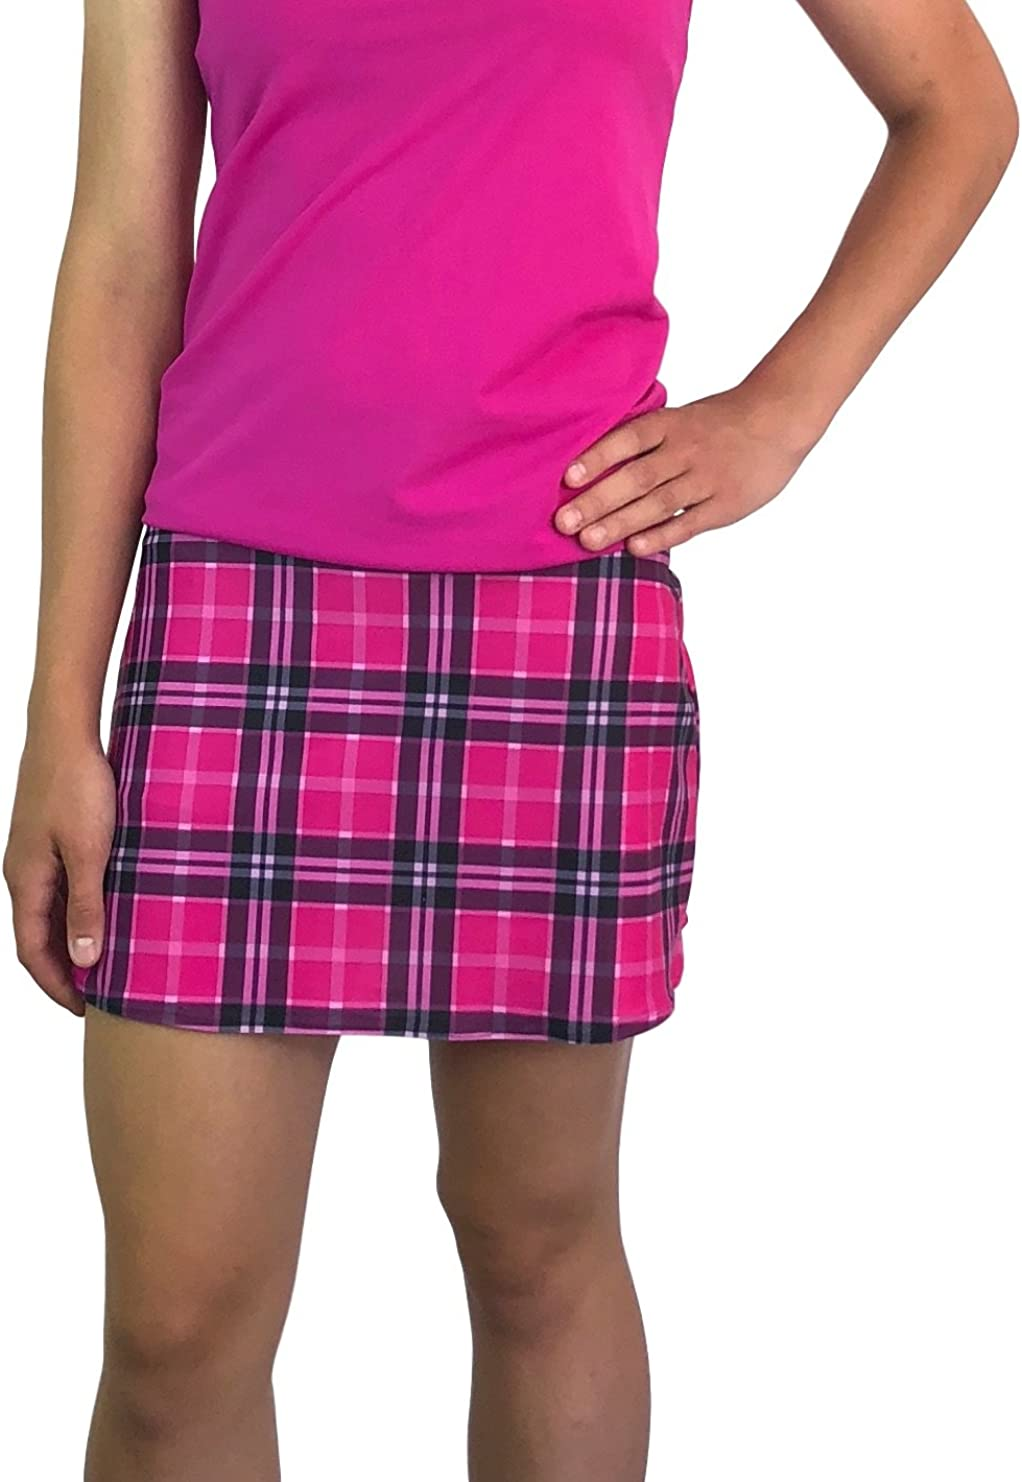 Pink Plaid Slim Golf Tennis Spasm Credence price Skort Made Skirt USA in -